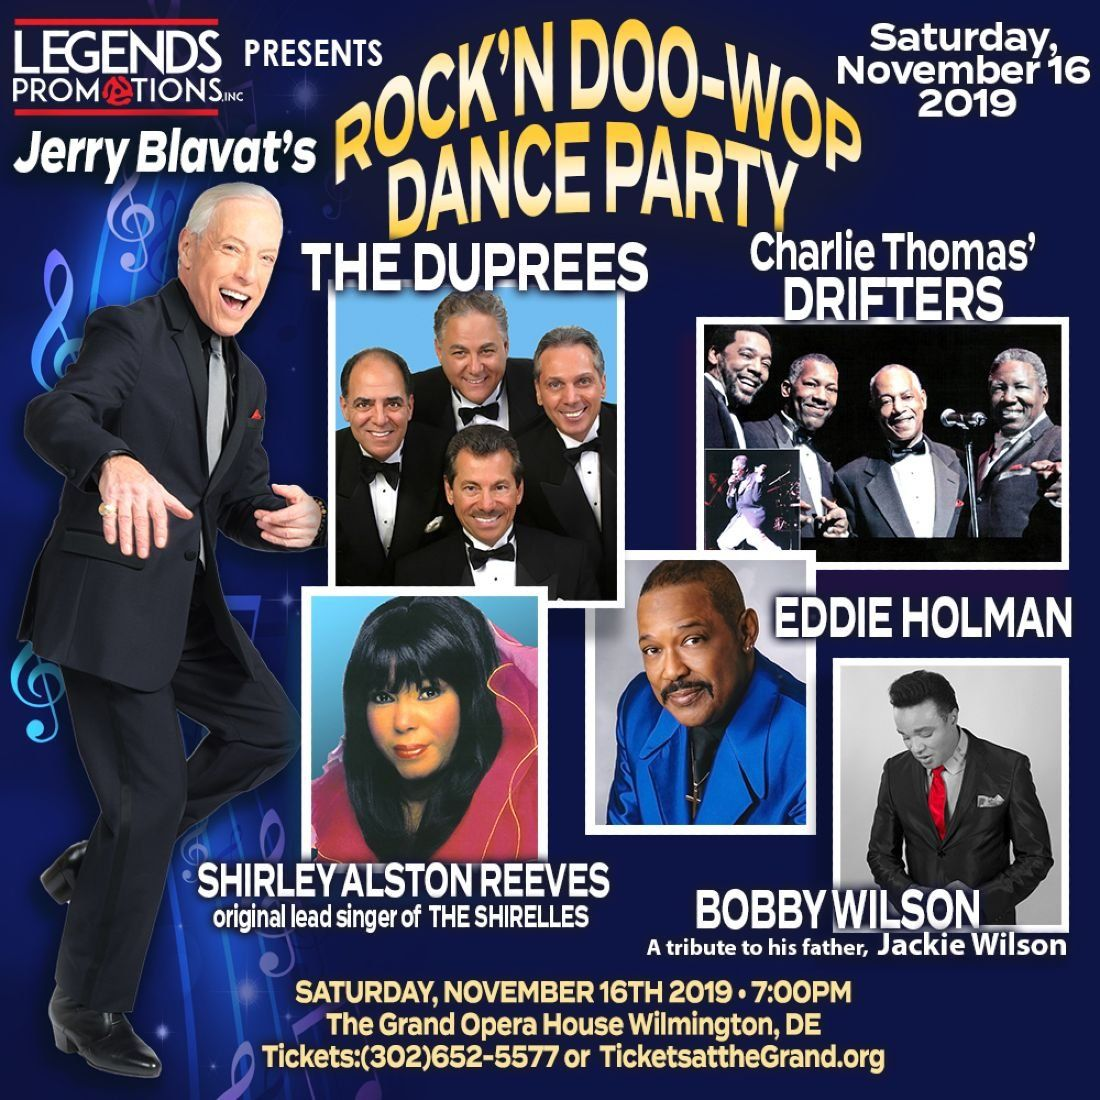 Jerry Blavats Rockn Doo Wop Dance Party